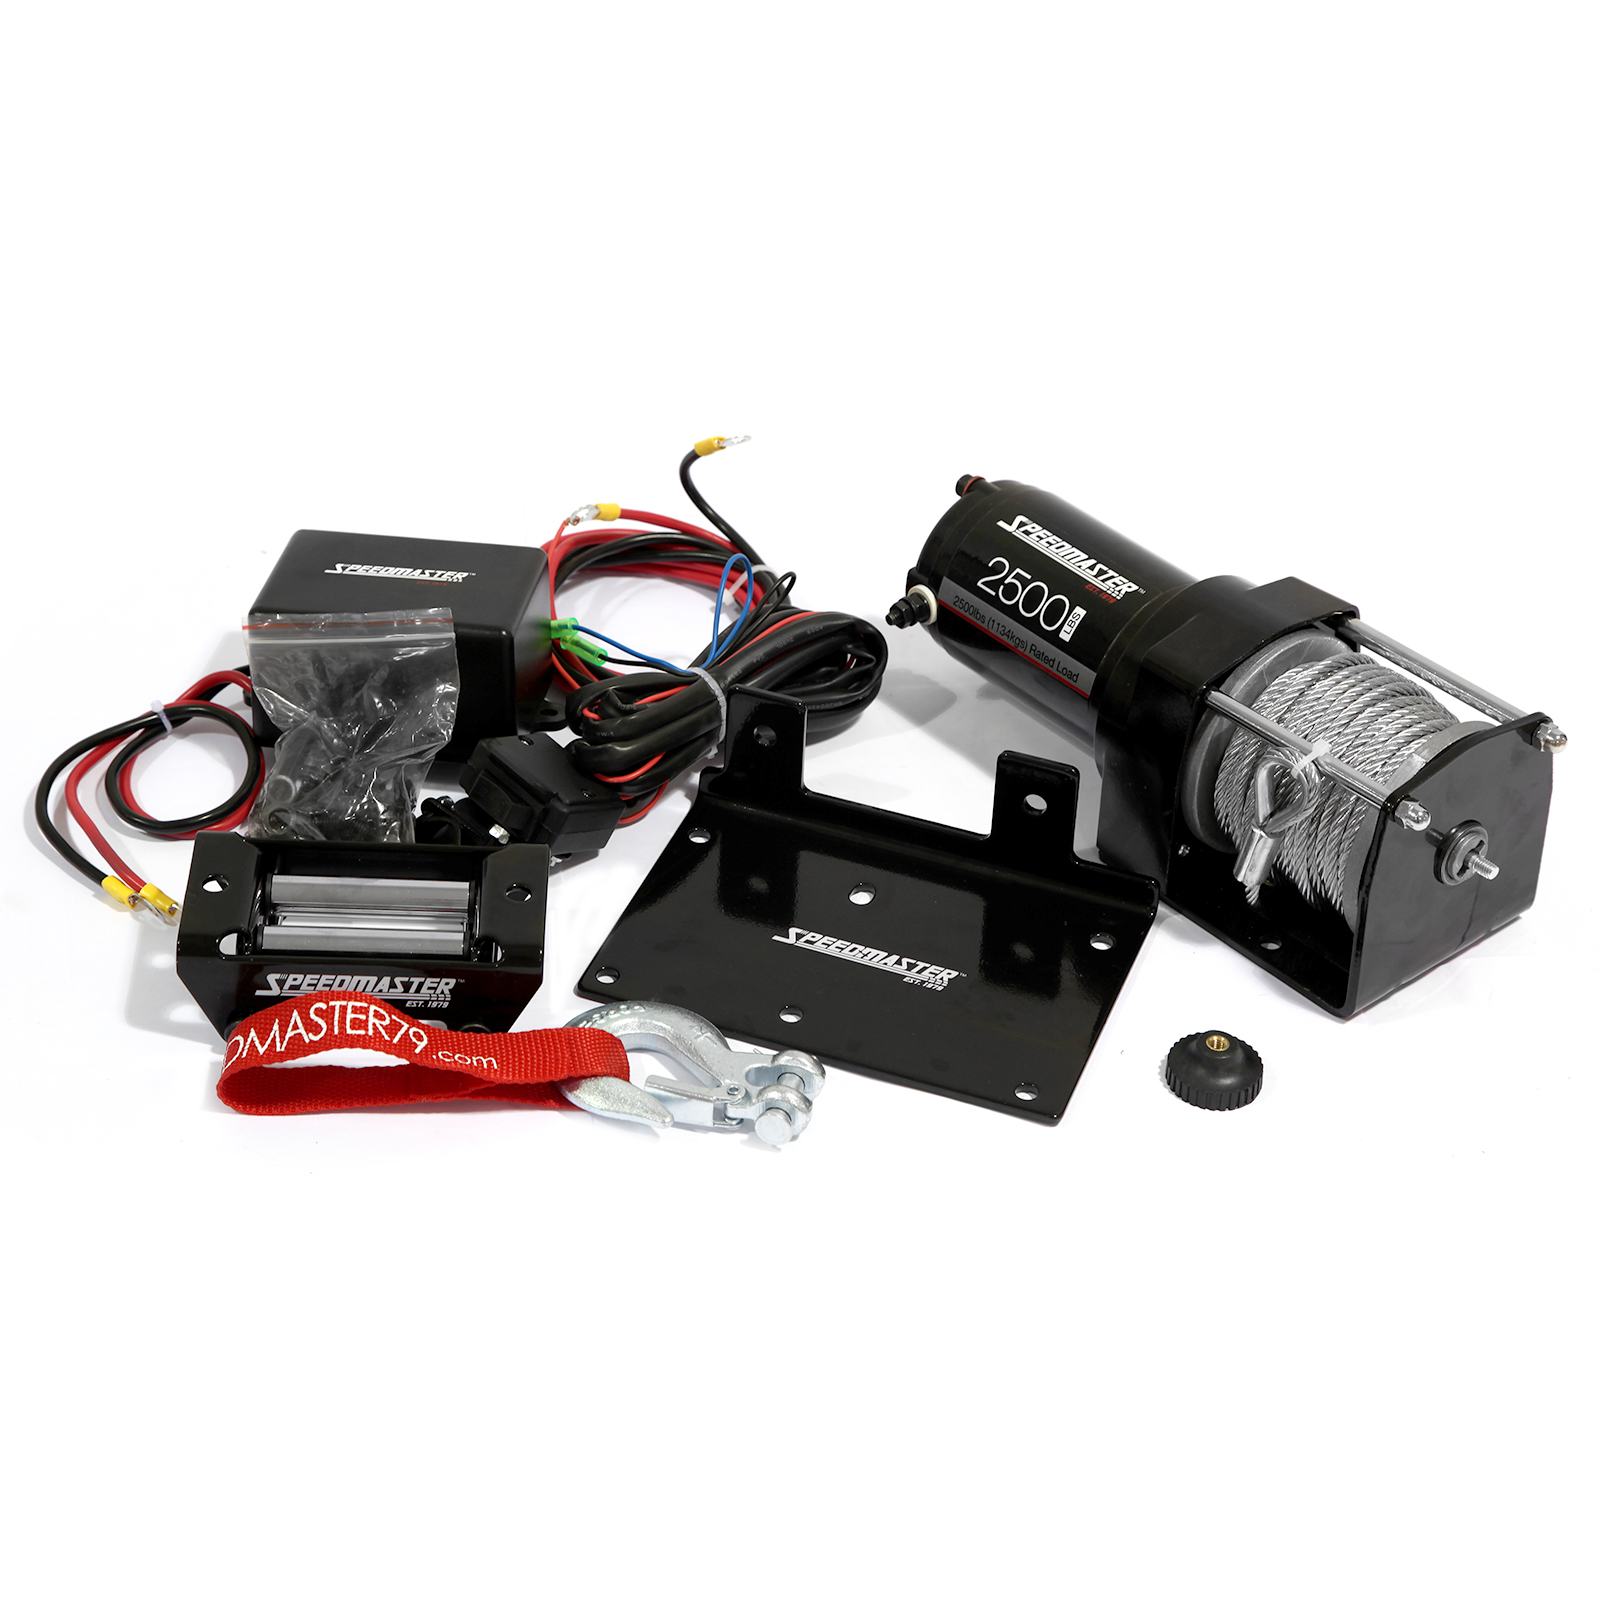 2500lbs / 1130kgs 12V Electric ATV Winch Kit w/ Remote Switch